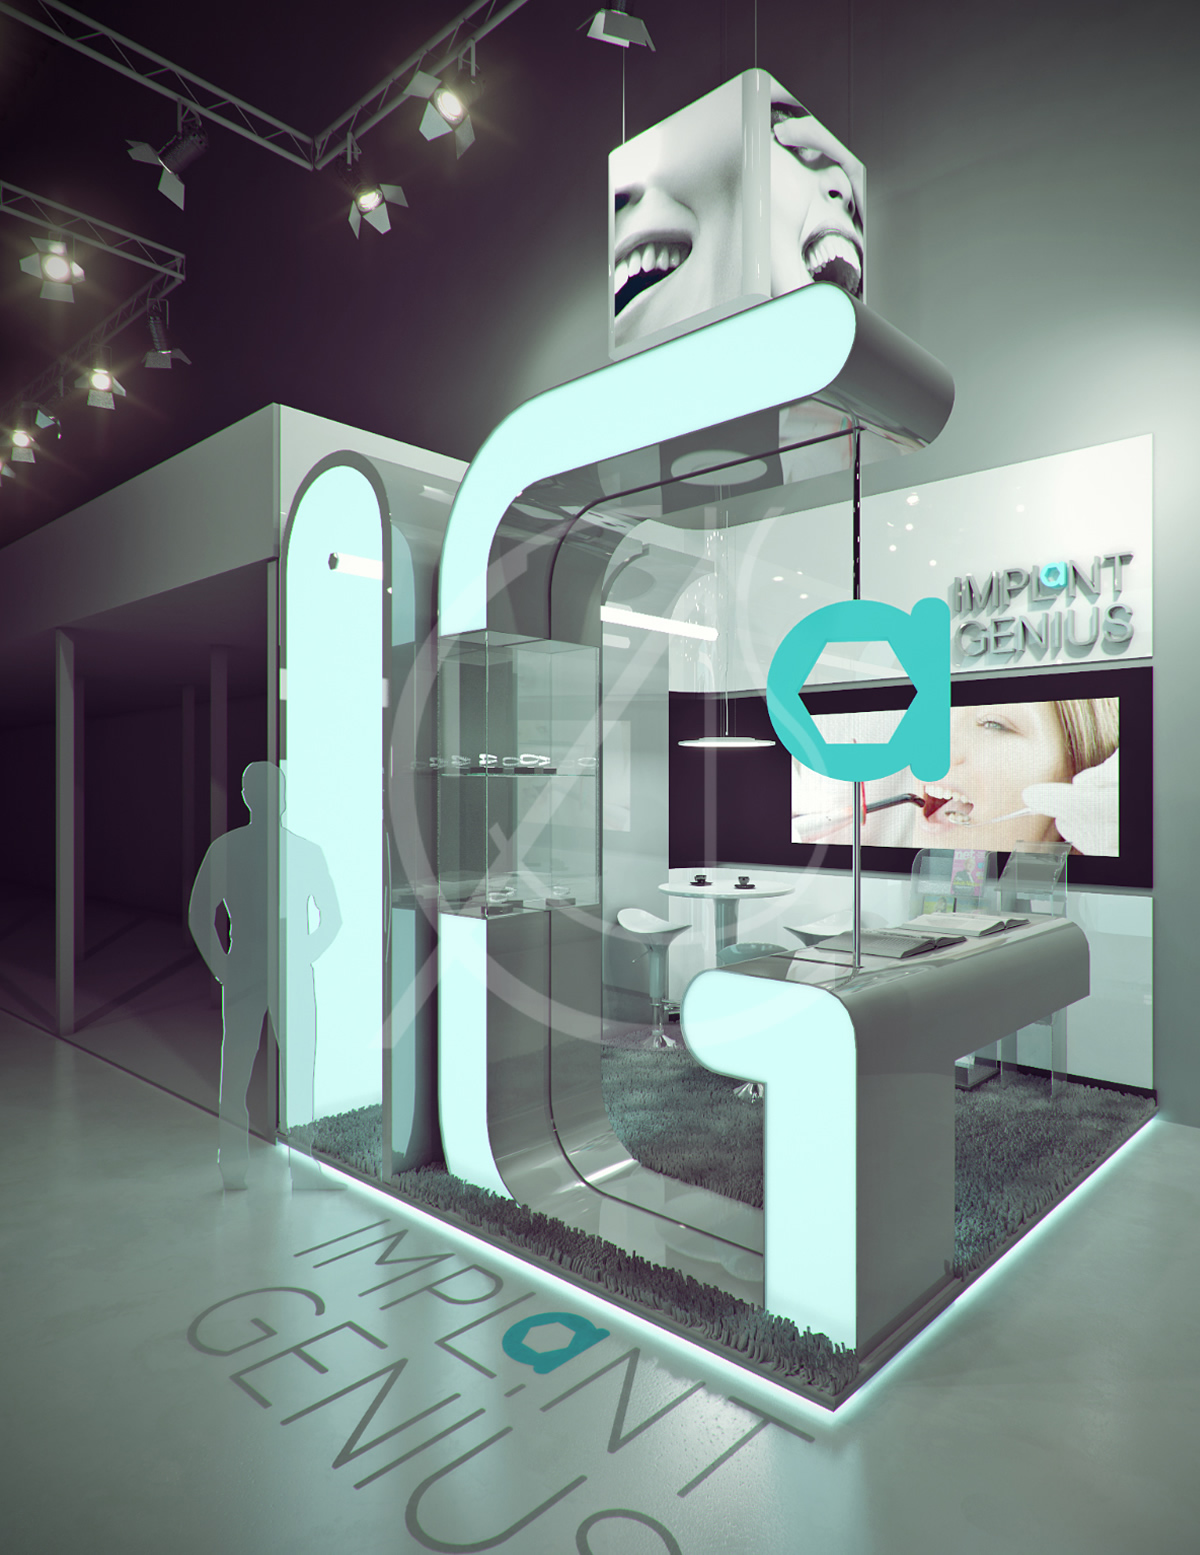 Exhibition Booth Design Concept : Dental exhibition booth design on architizer